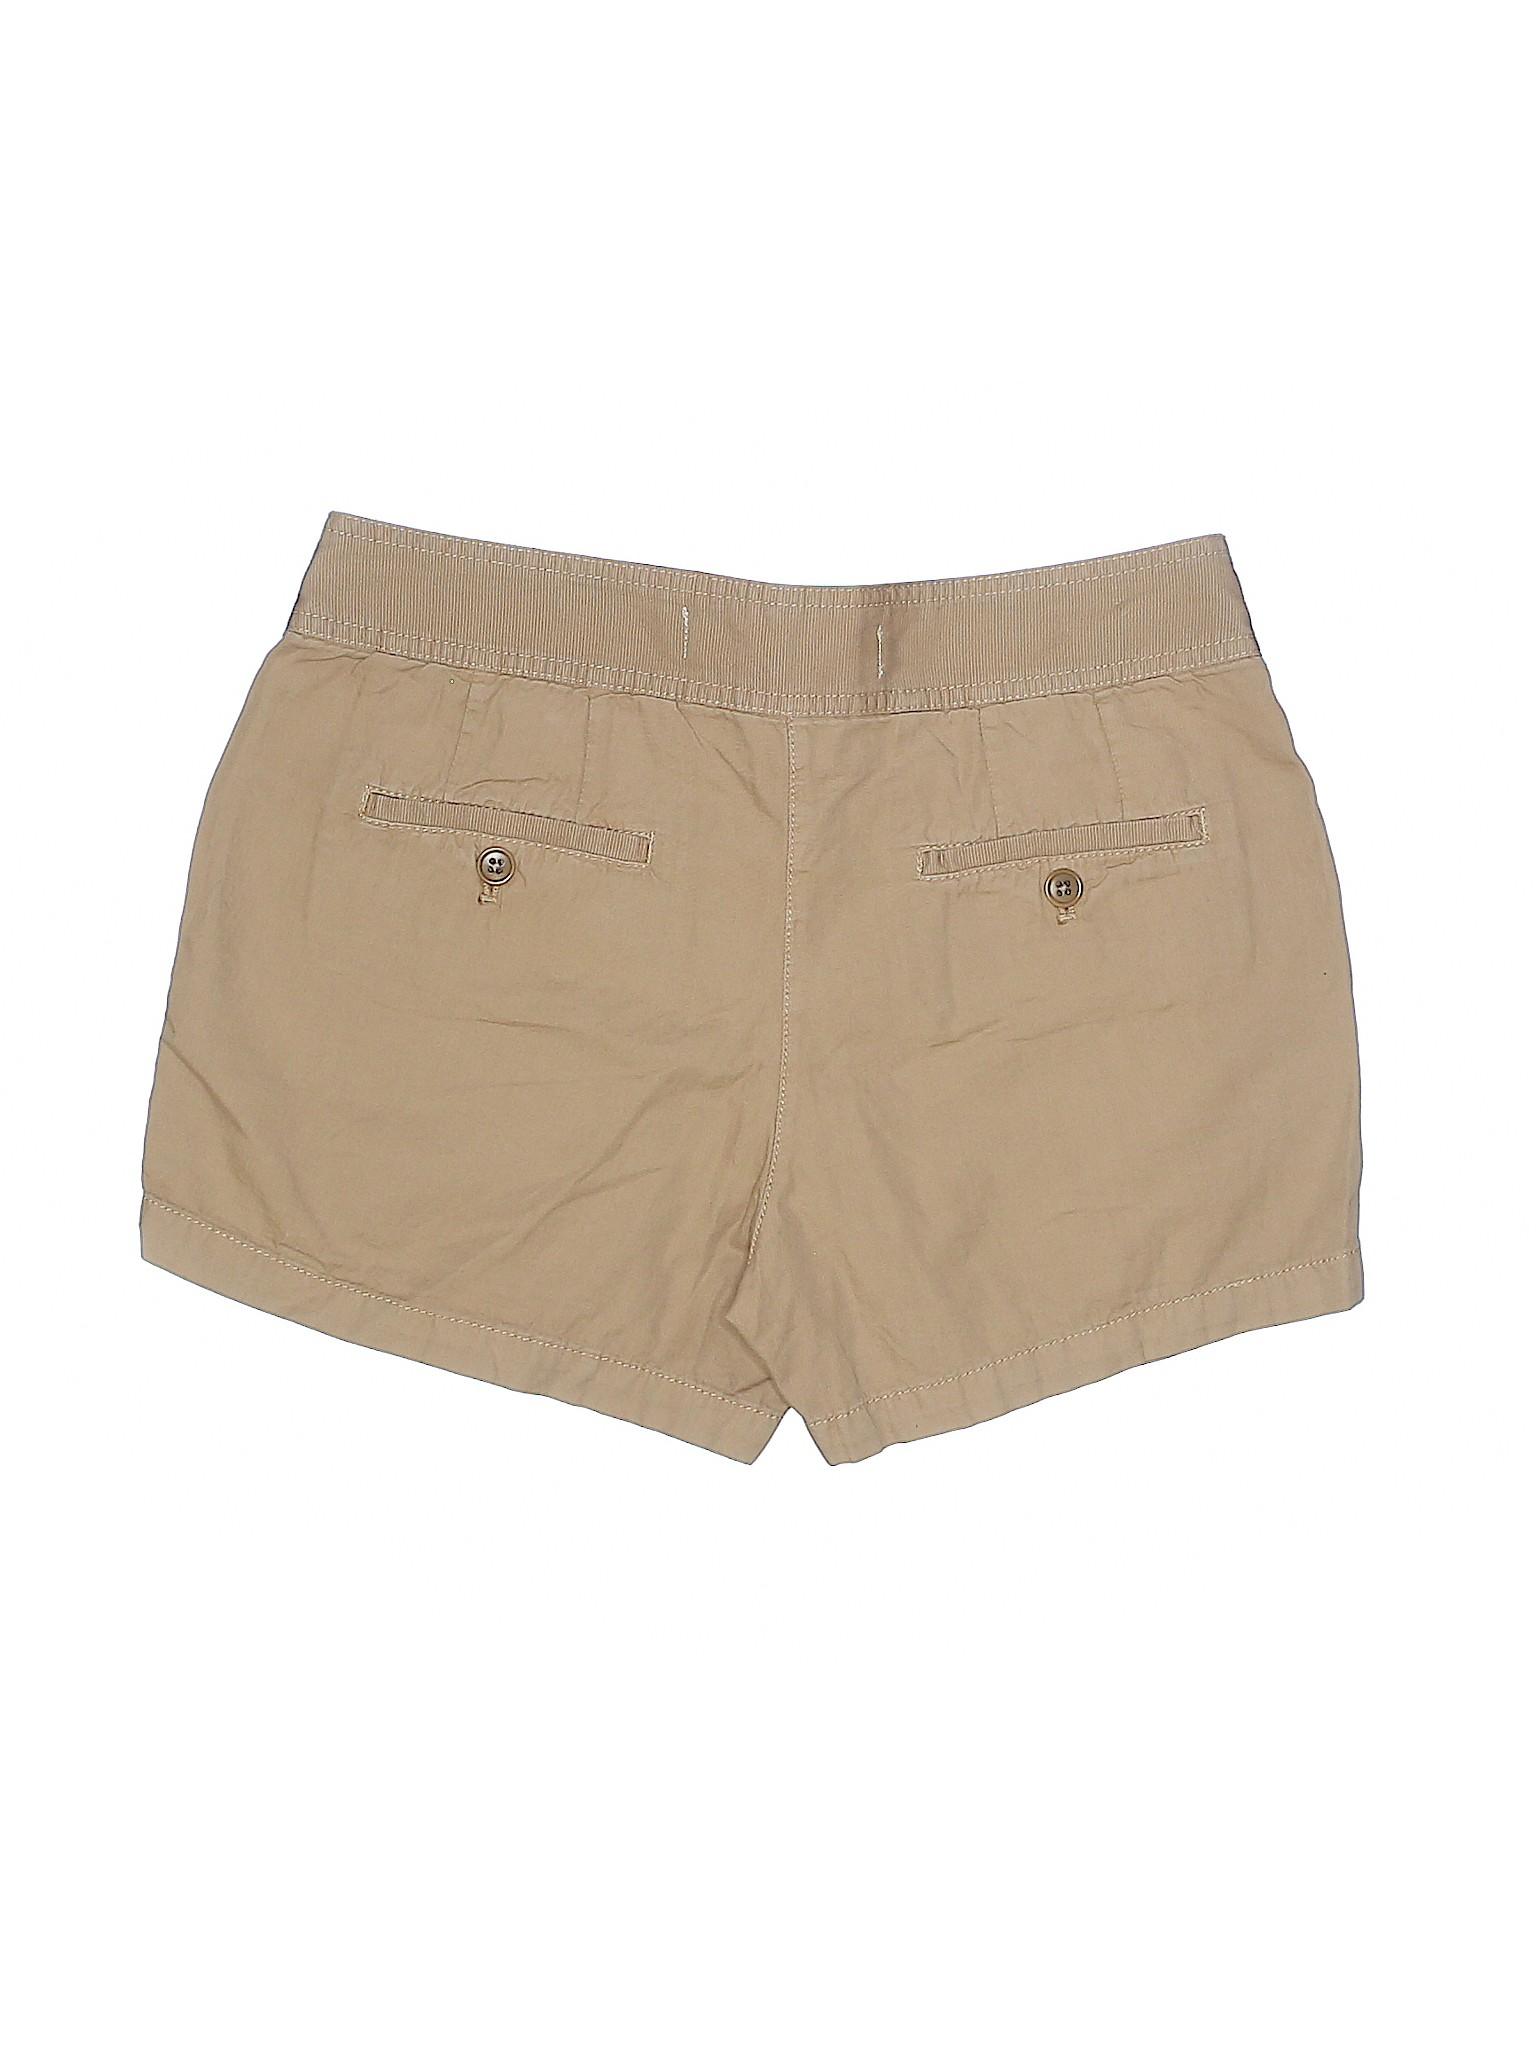 Crew Shorts winter J Boutique Khaki O6wHUqnCx